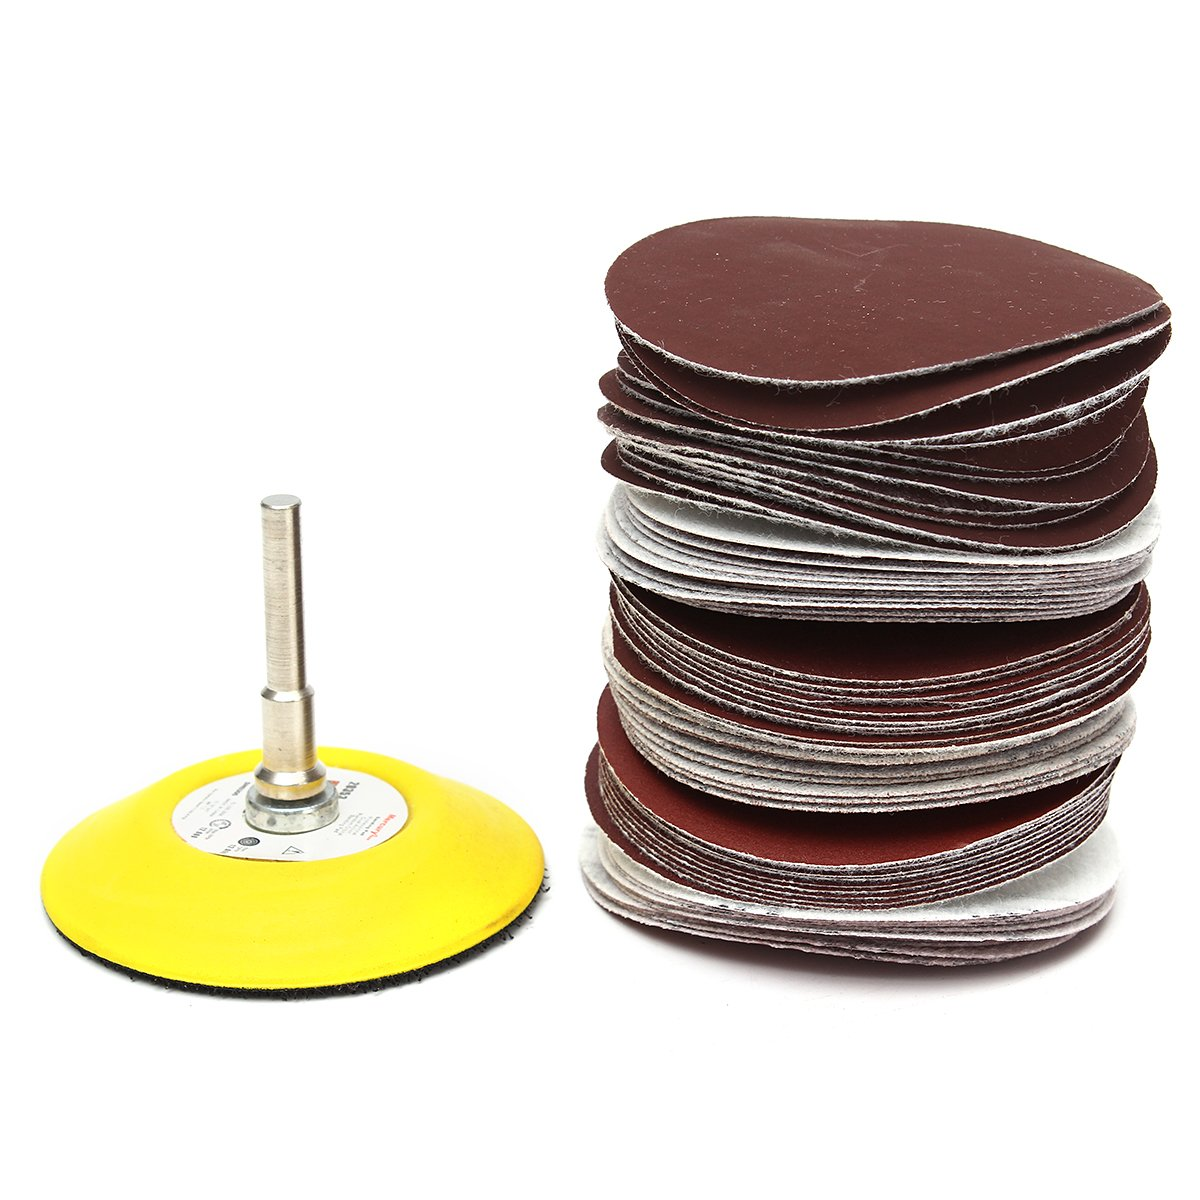 Jeteven 100 Pcs Sanding Discs, 2 inch 80-3000 Grit Sander Discs Pads for Sandpaper Sheet Assorted JETEVENHOCORA1137